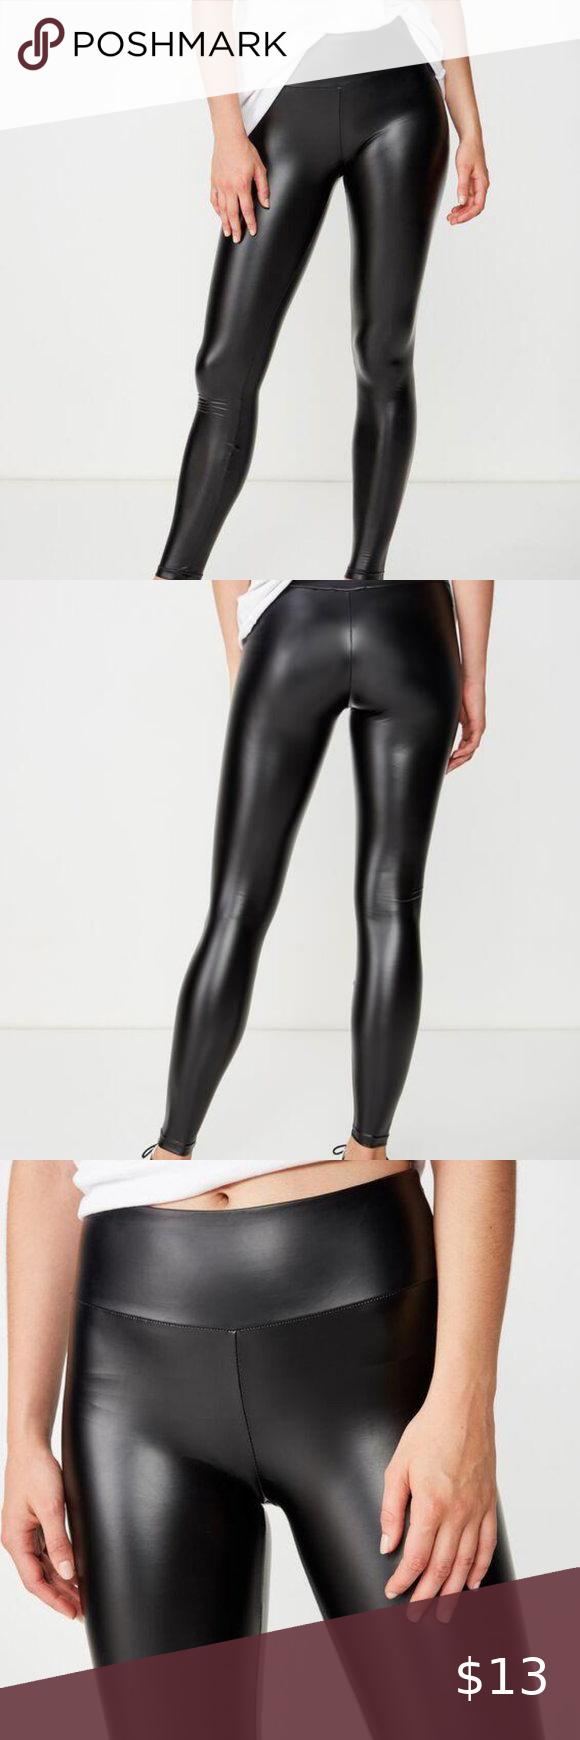 Cotton On Dakota Black Dakota Detail Leggings In 2020 Solid Black Leggings Clothes Design Colorful Leggings